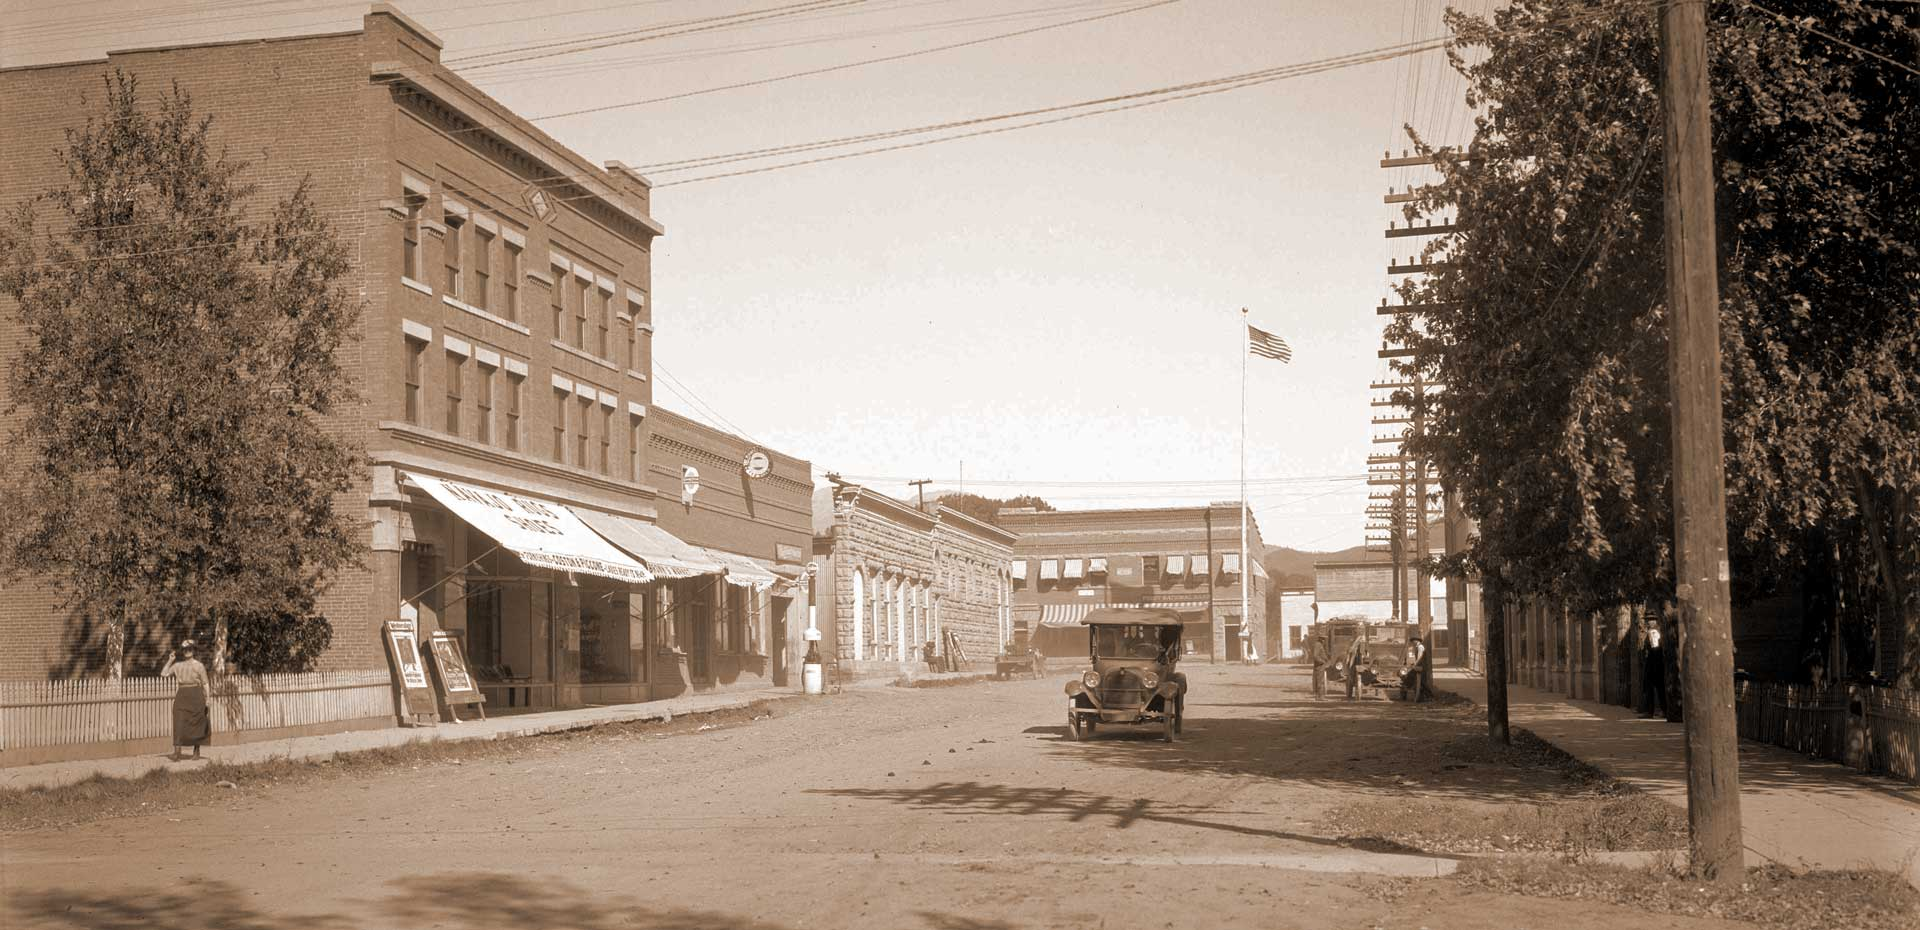 Downtown Mancos